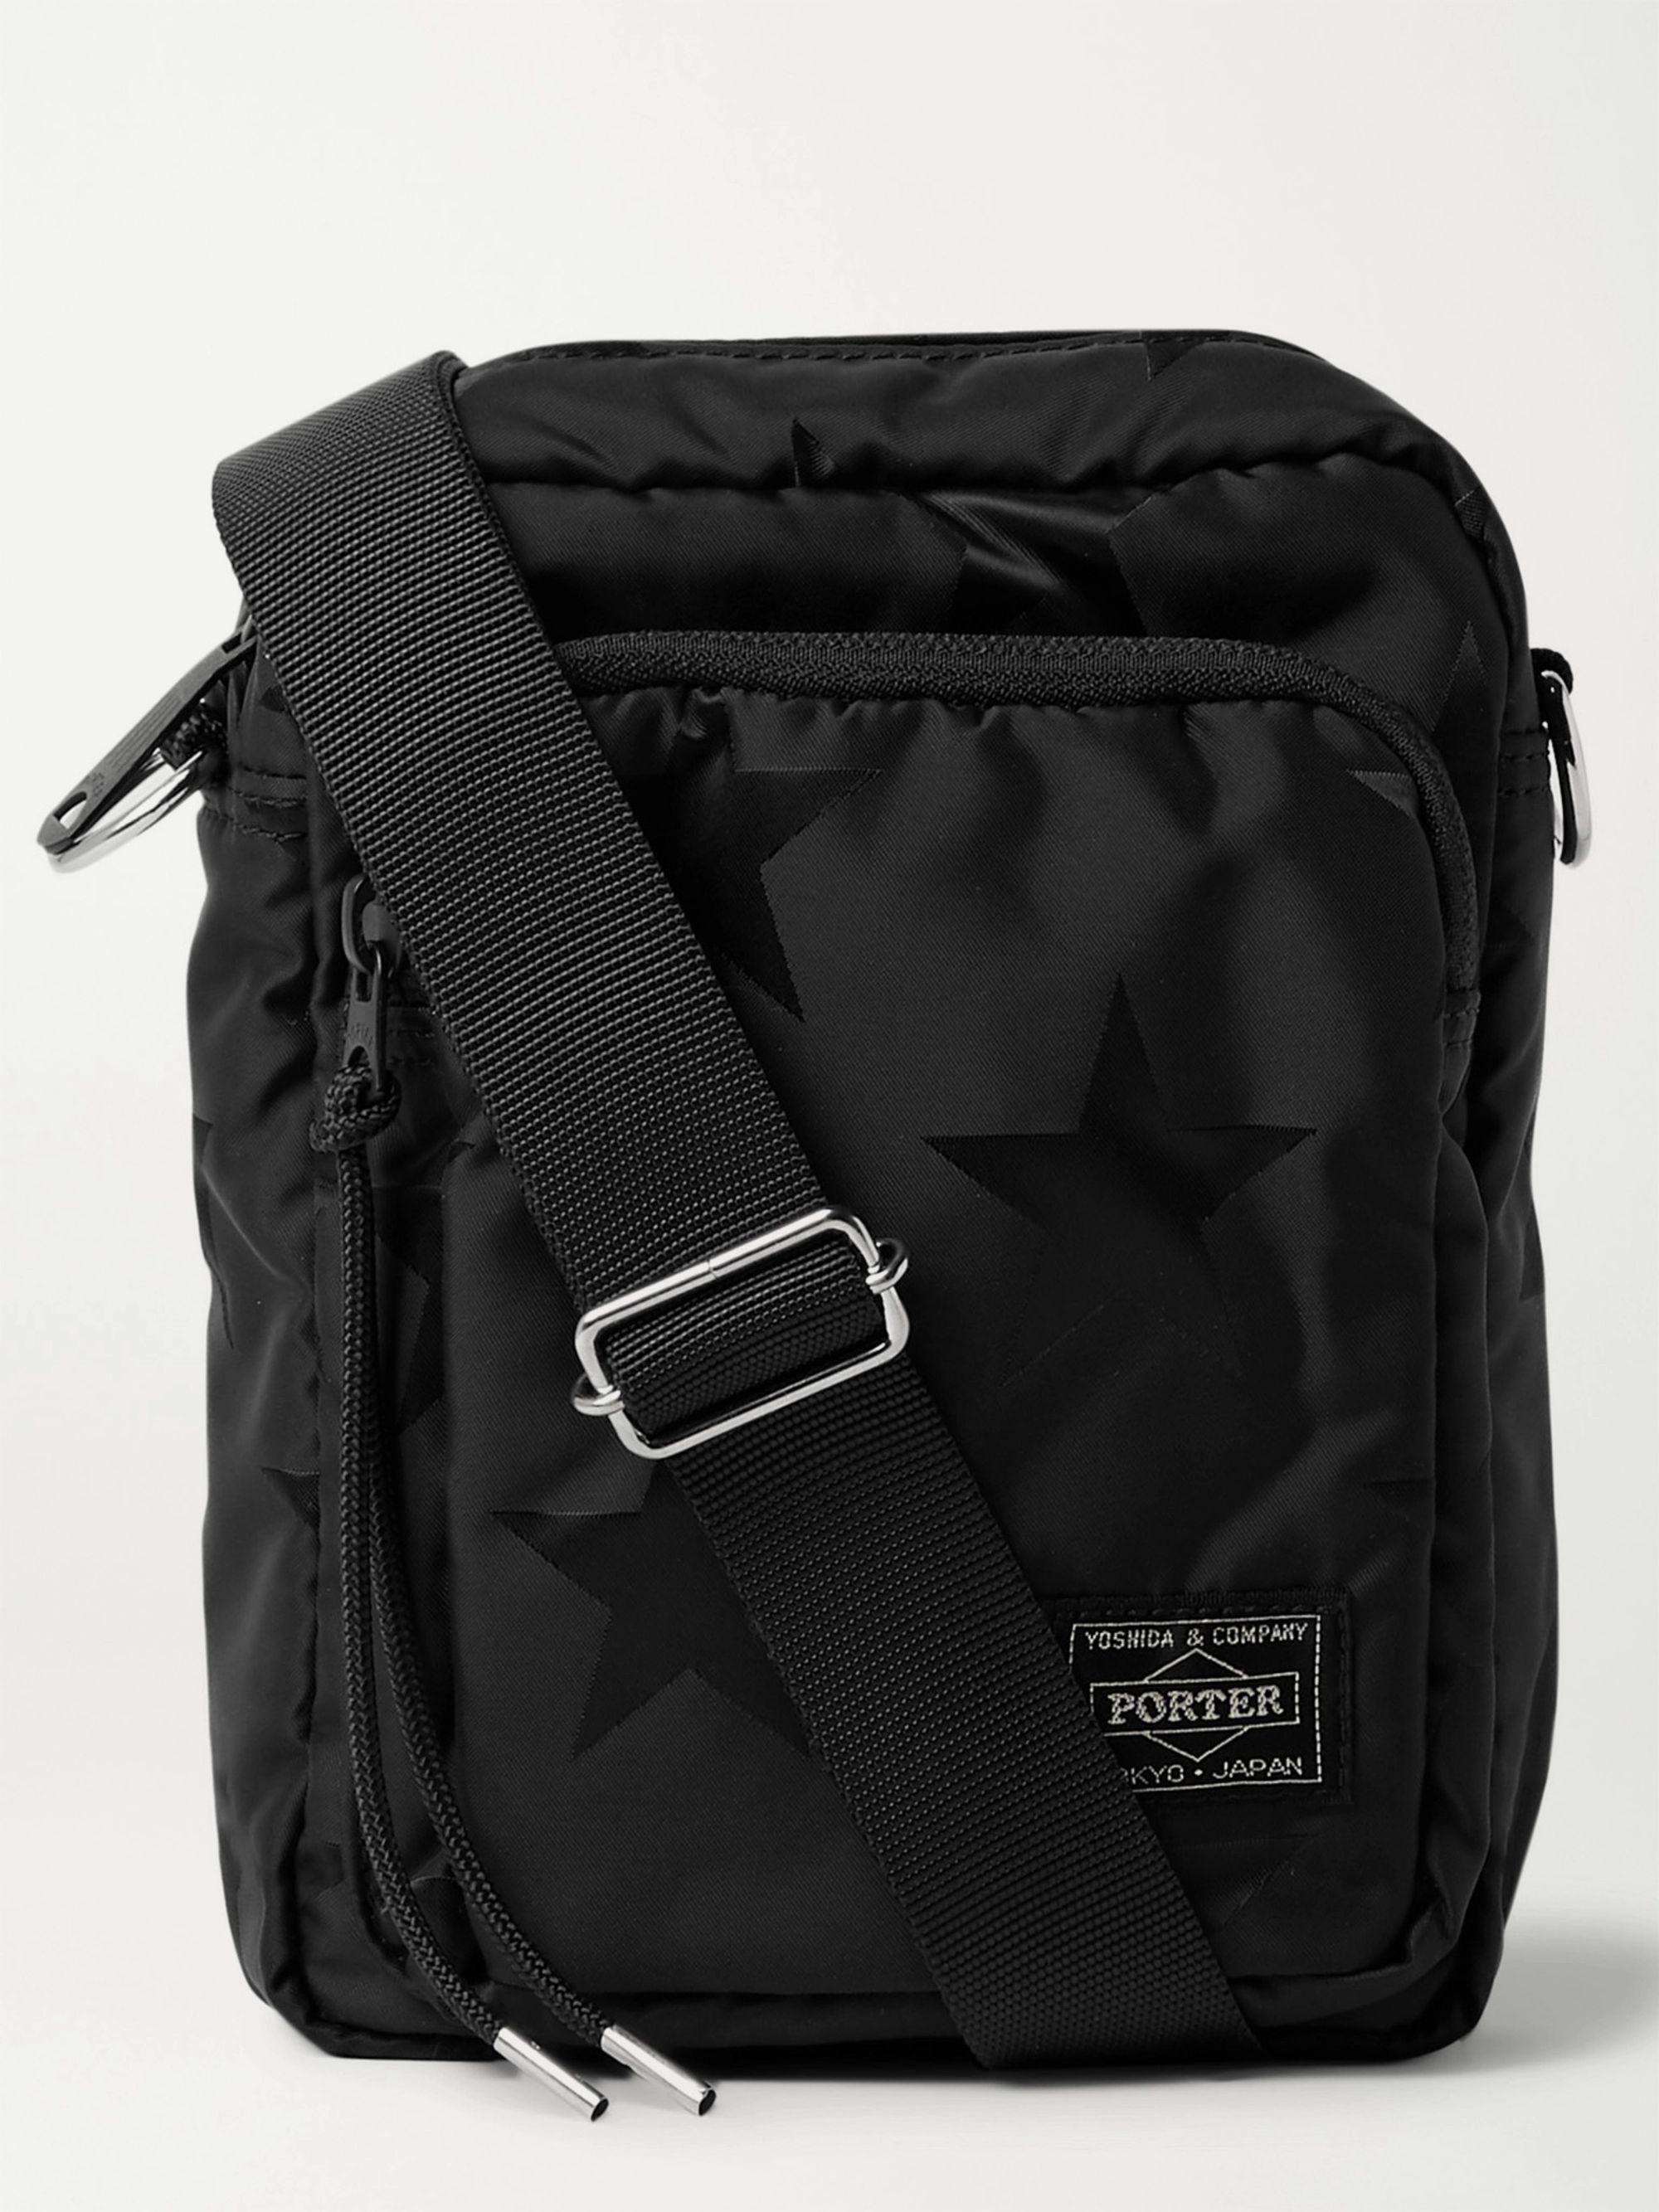 PORTER-YOSHIDA & CO Star-Print Nylon Messenger Bag,Black